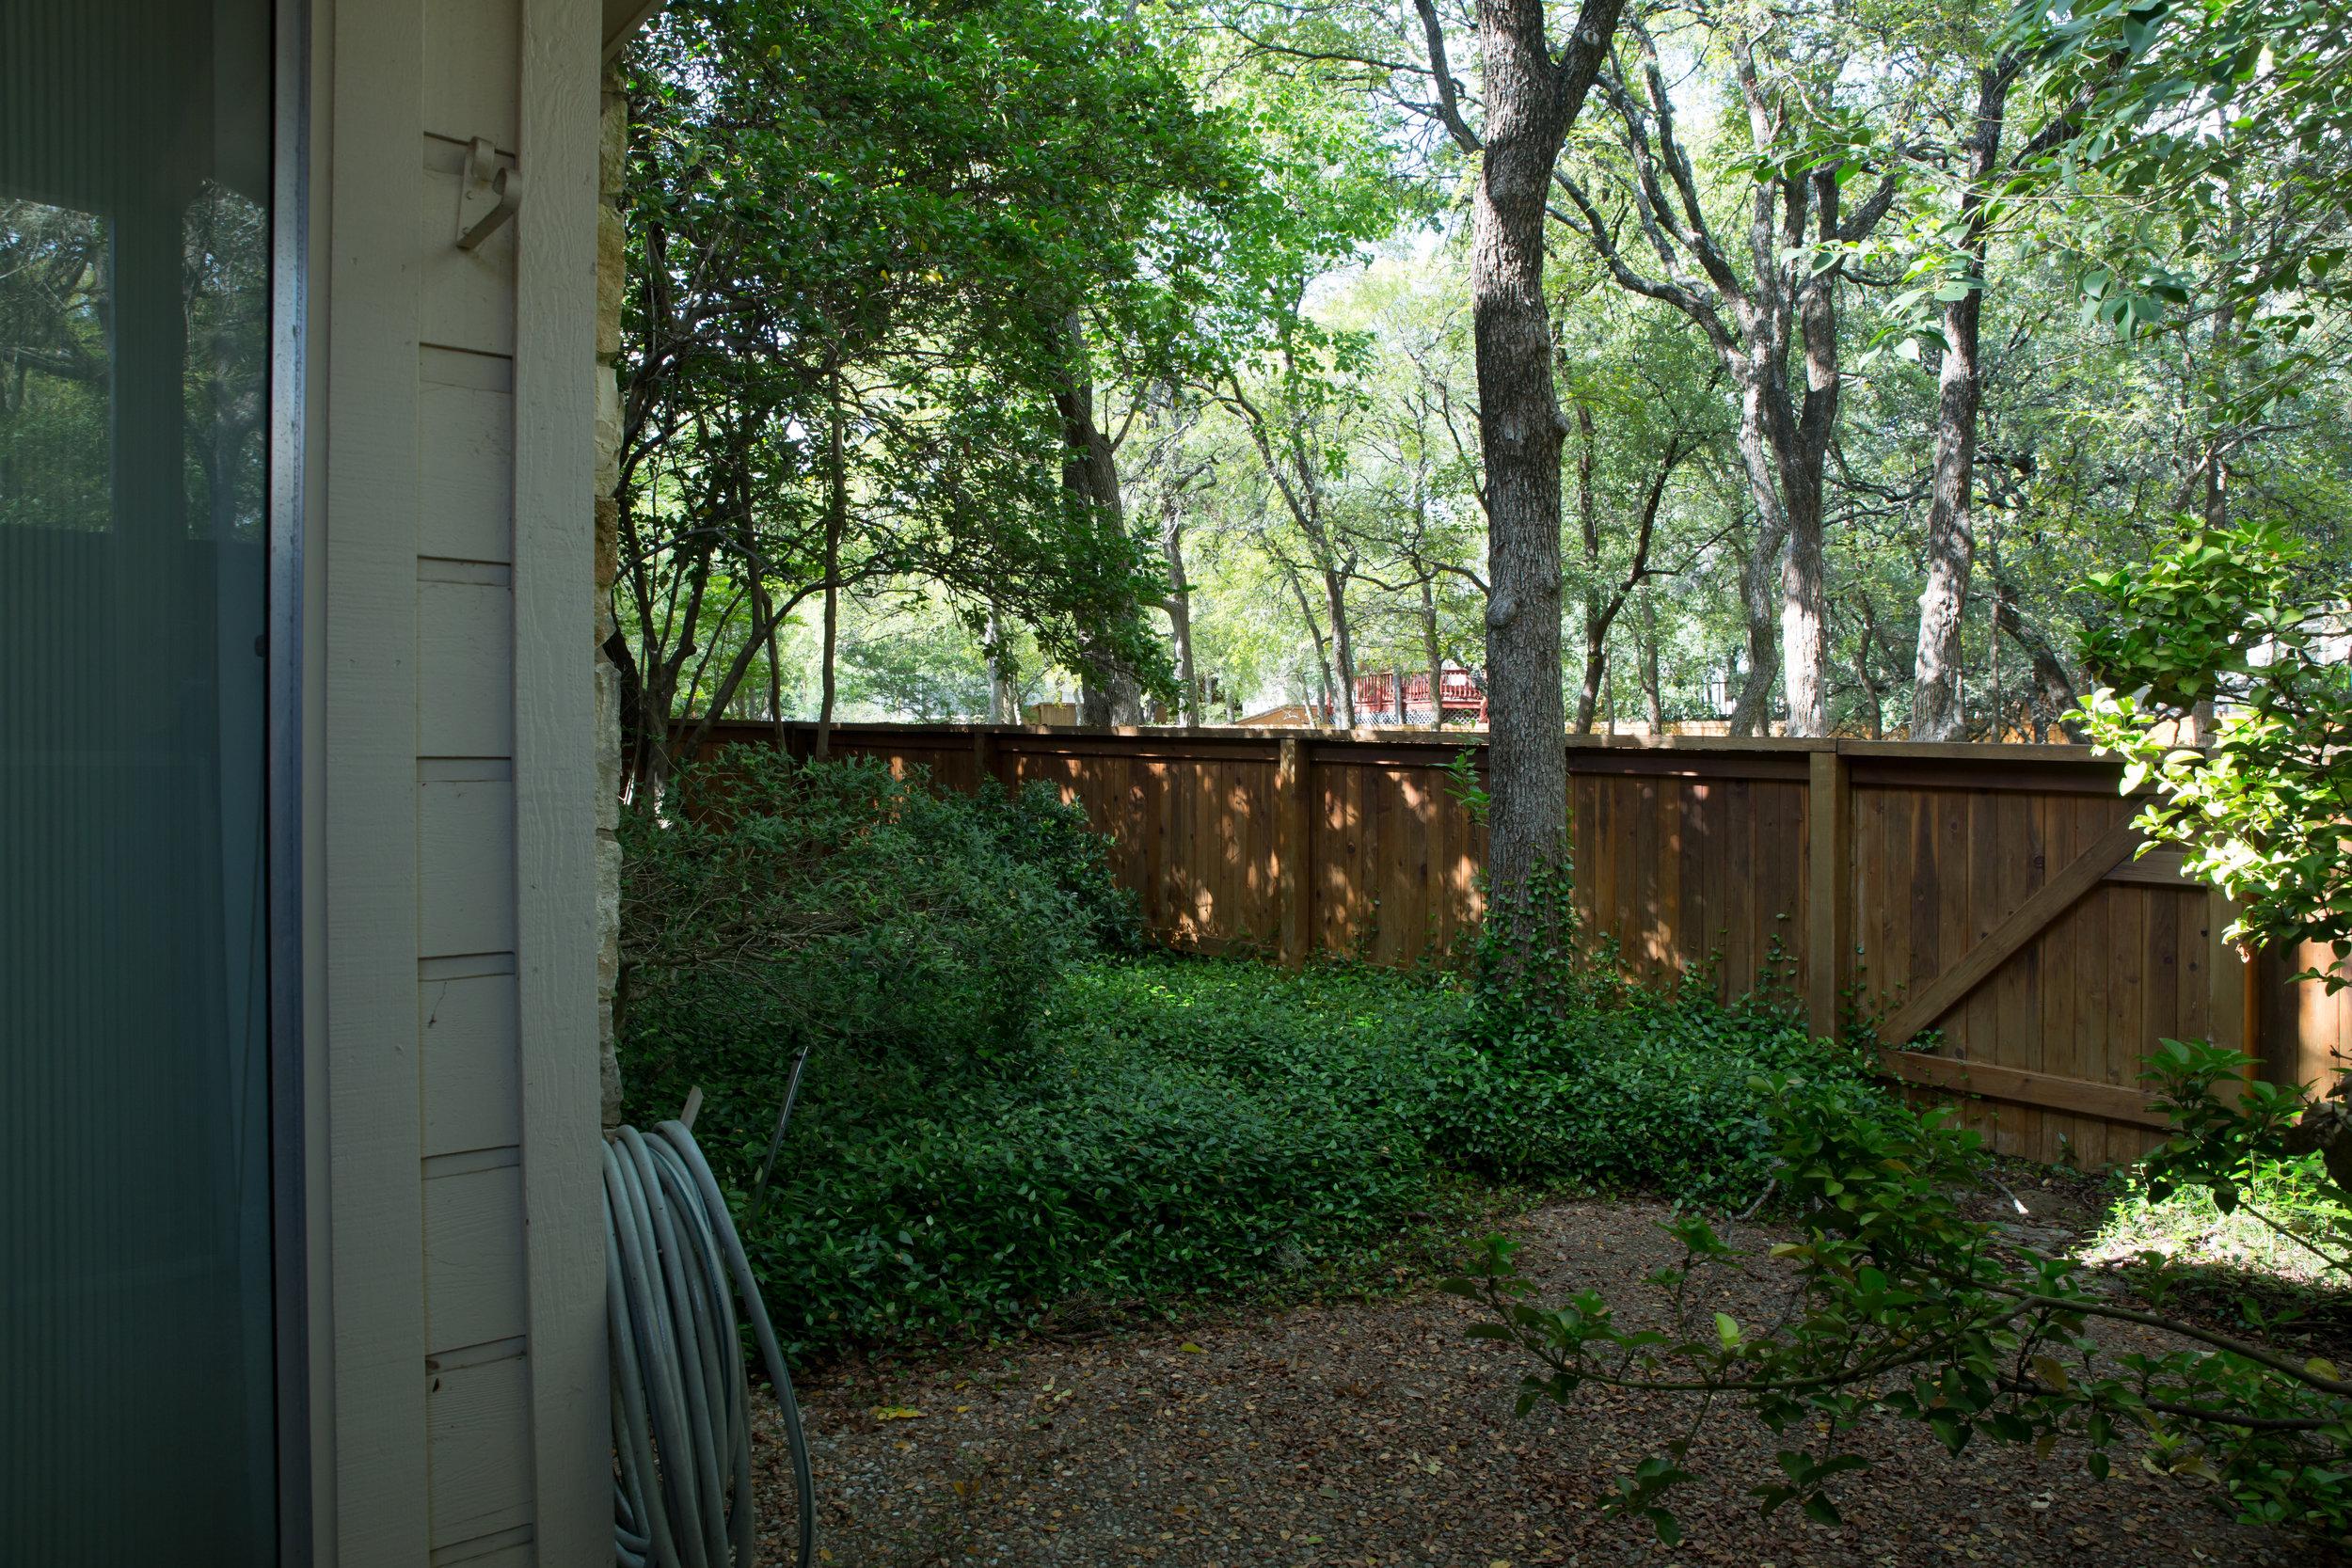 Overgrown Backyard Before Redesign